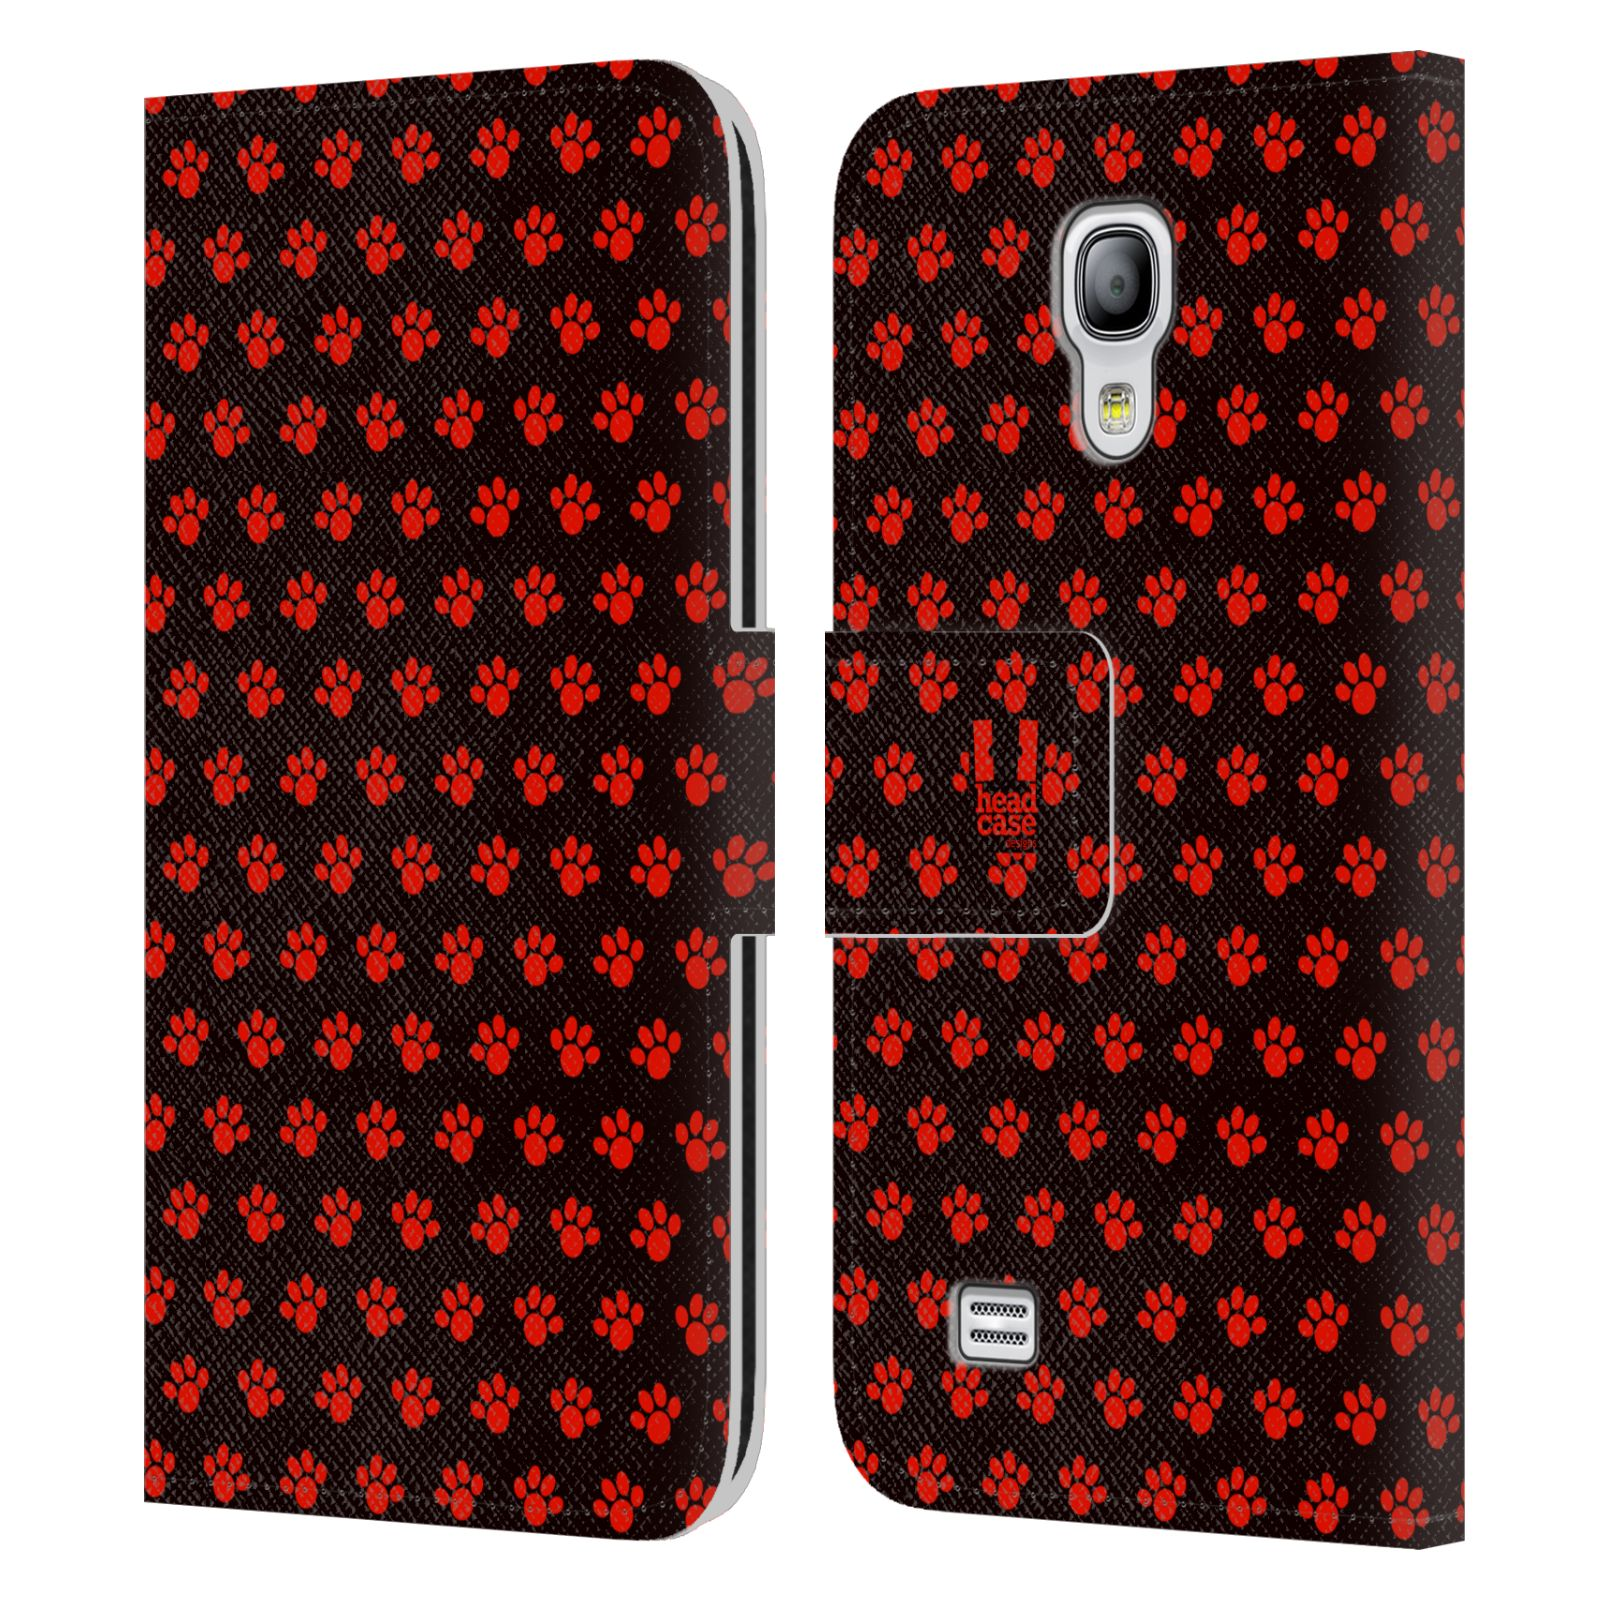 HEAD CASE Flipové pouzdro pro mobil Samsung Galaxy S4 MINI / S4 MINI DUOS Pejsek ťapky ccc